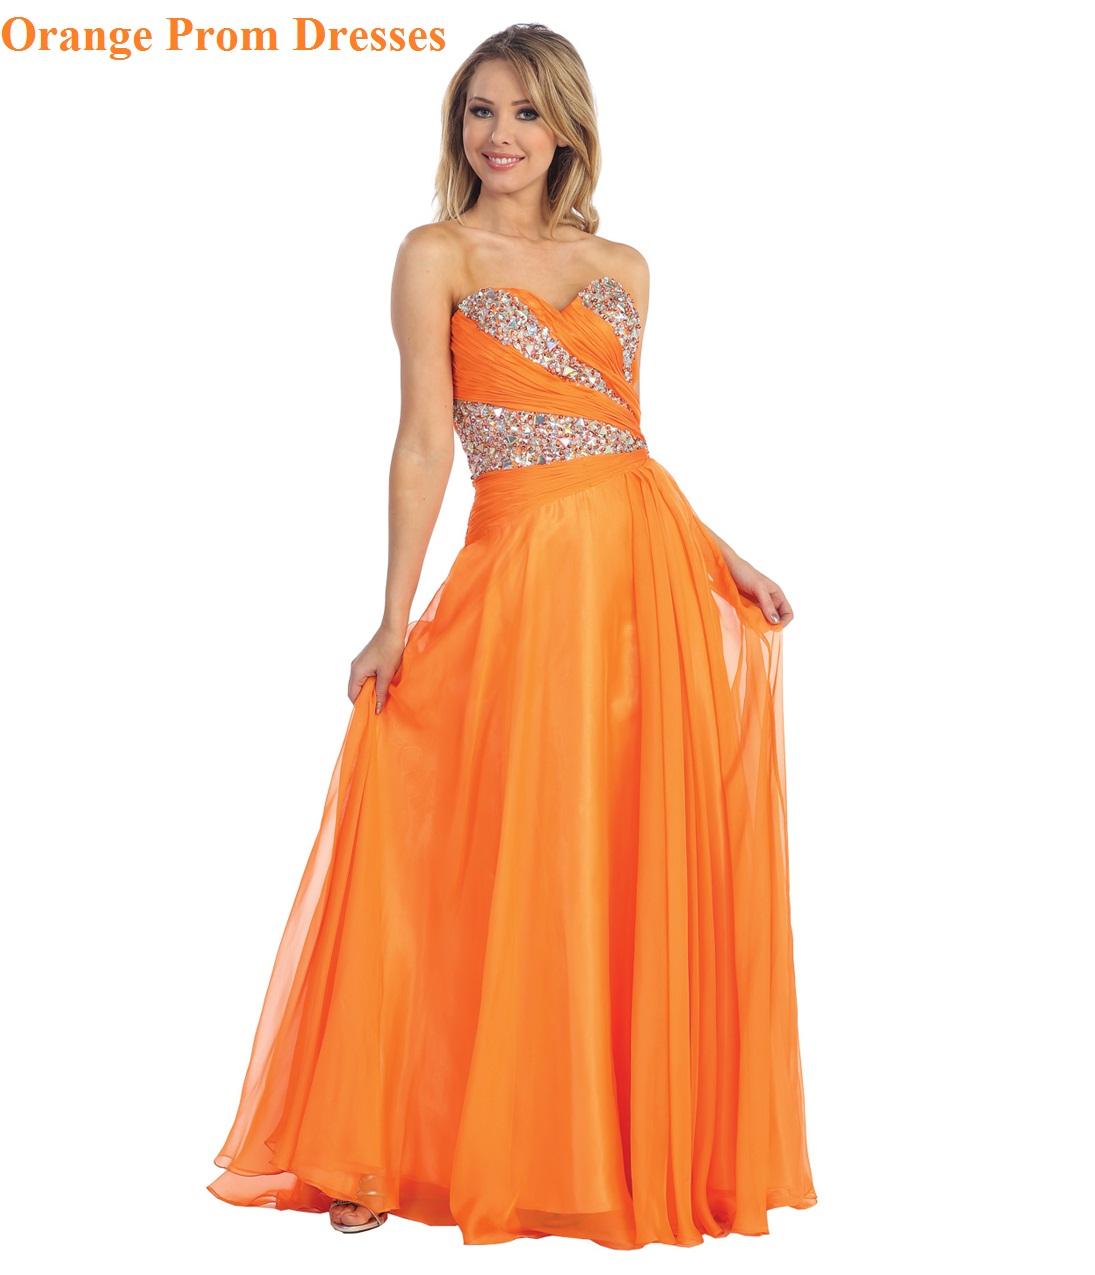 Orange Prom Dresses - Orange Dresses for Prom ~ Simply